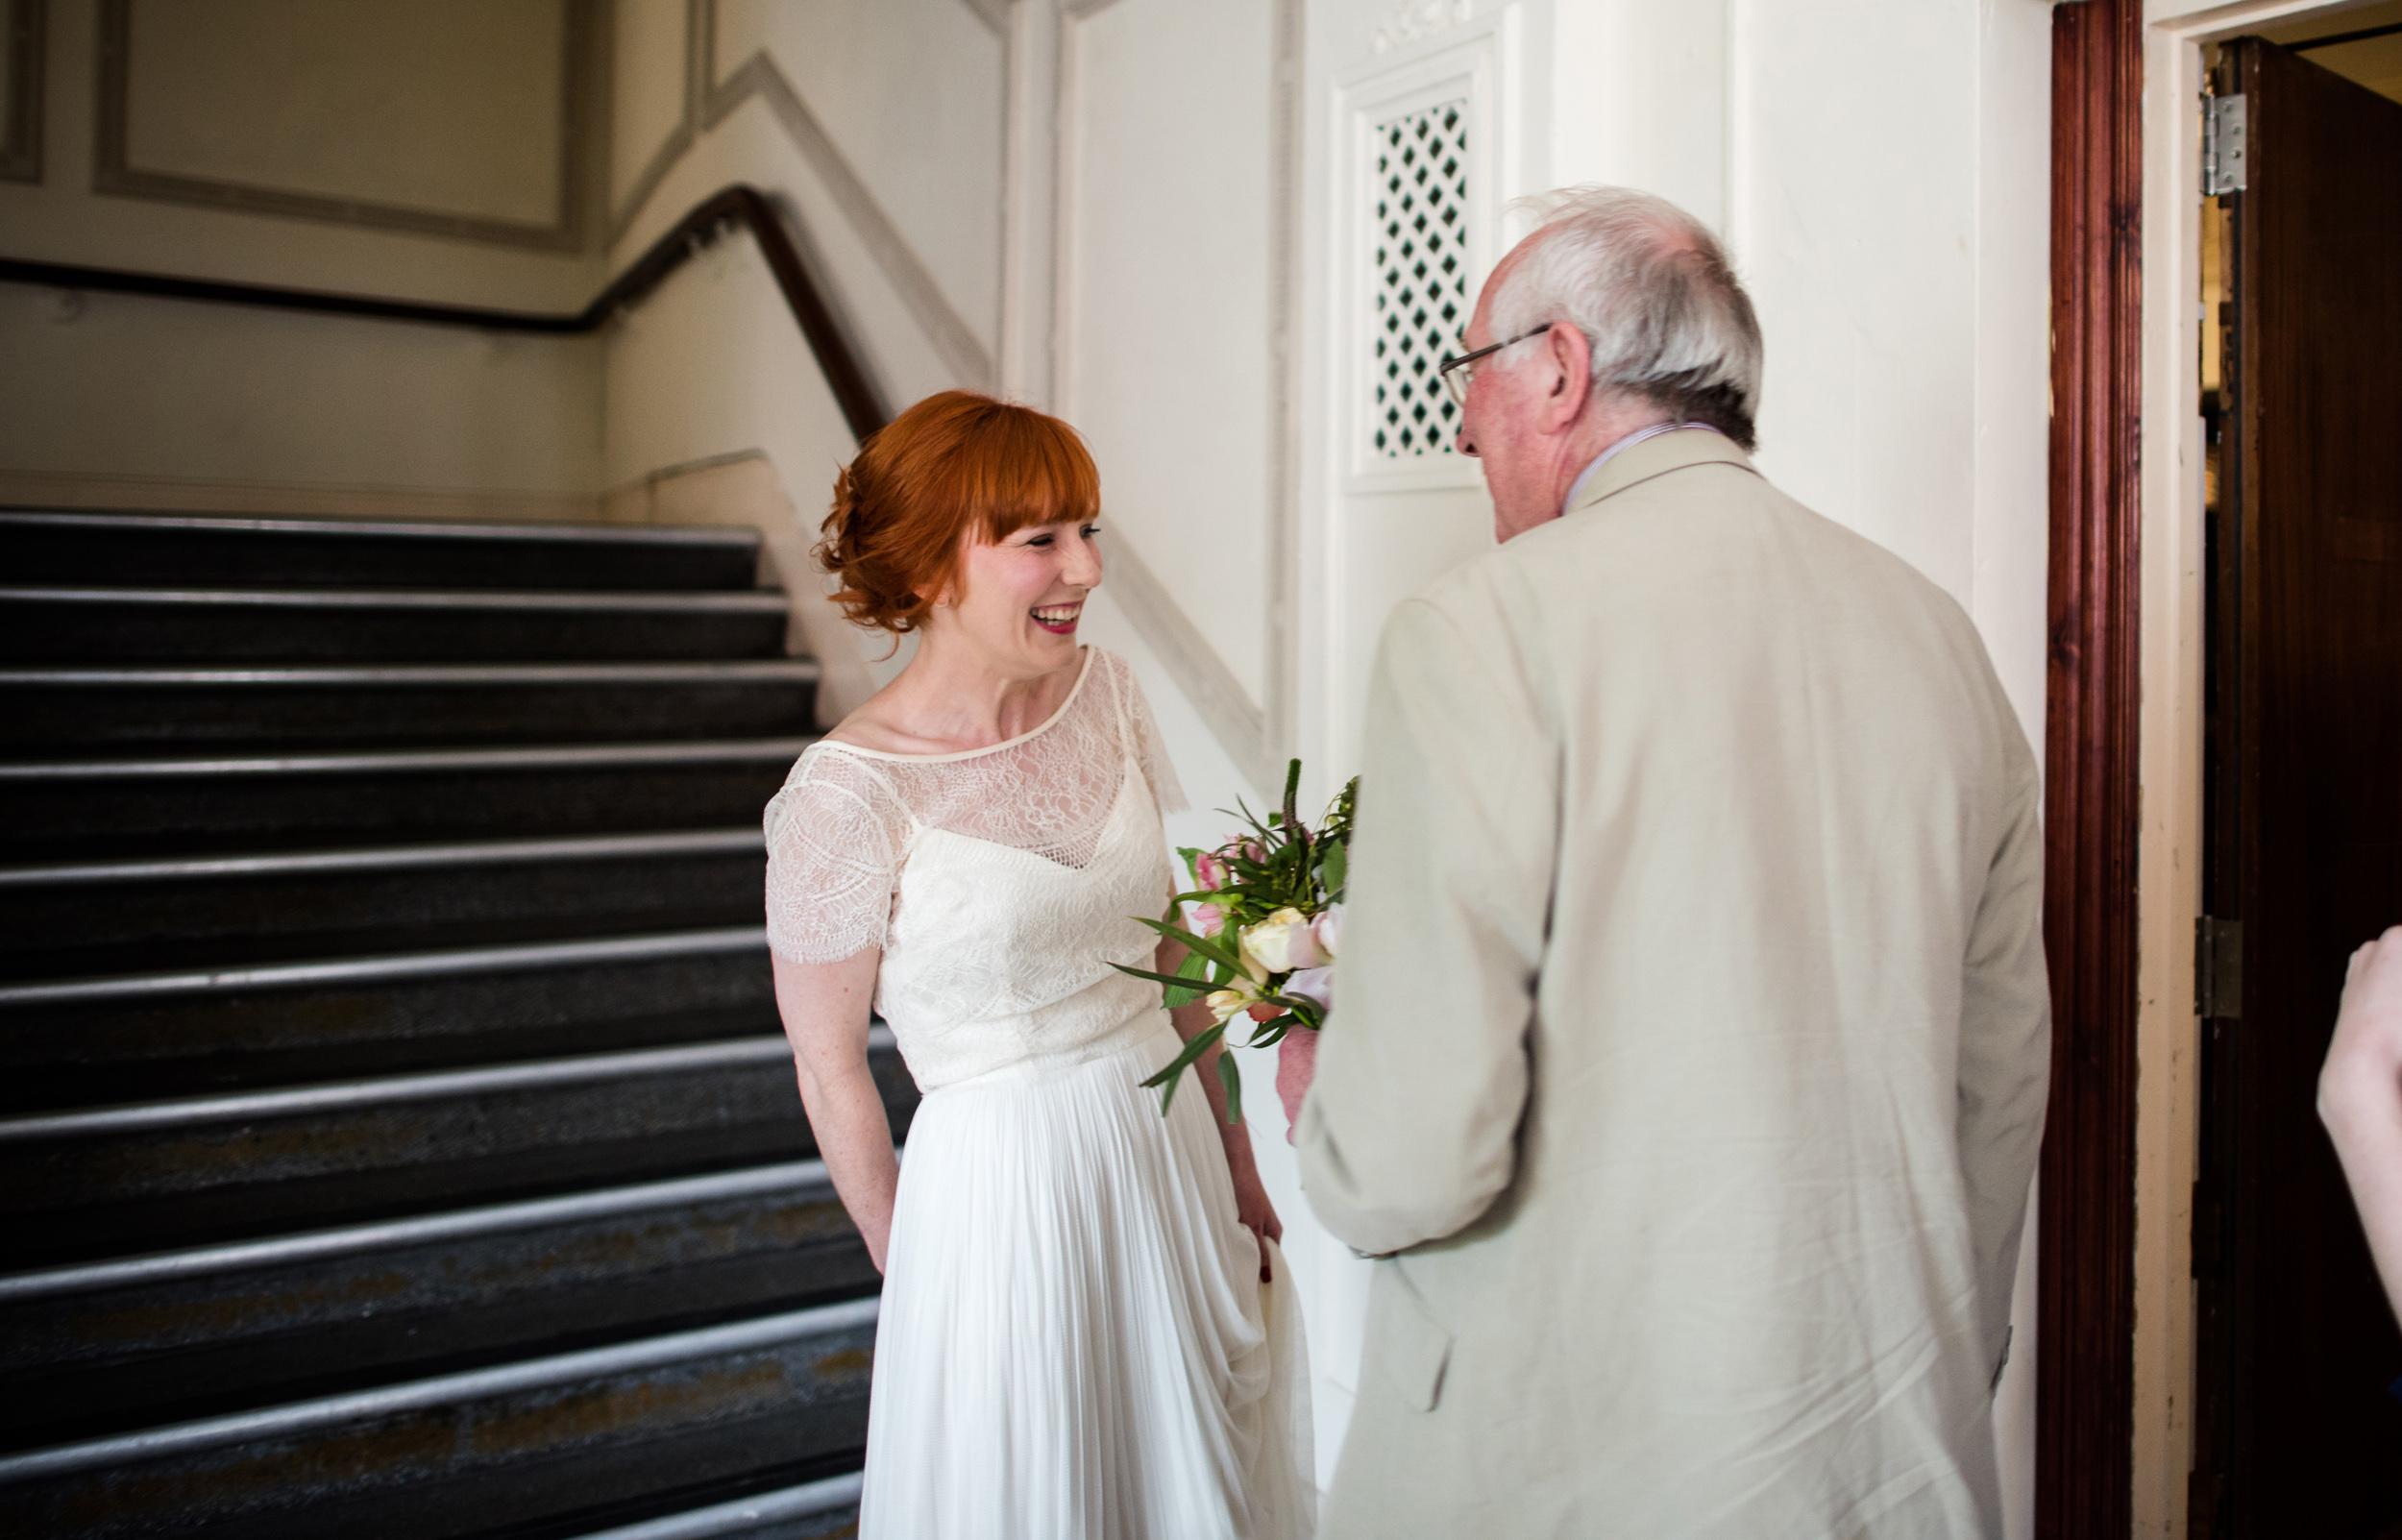 Jill-kate-Beaumont-Lace-Sheffield-Wedding-2.jpg